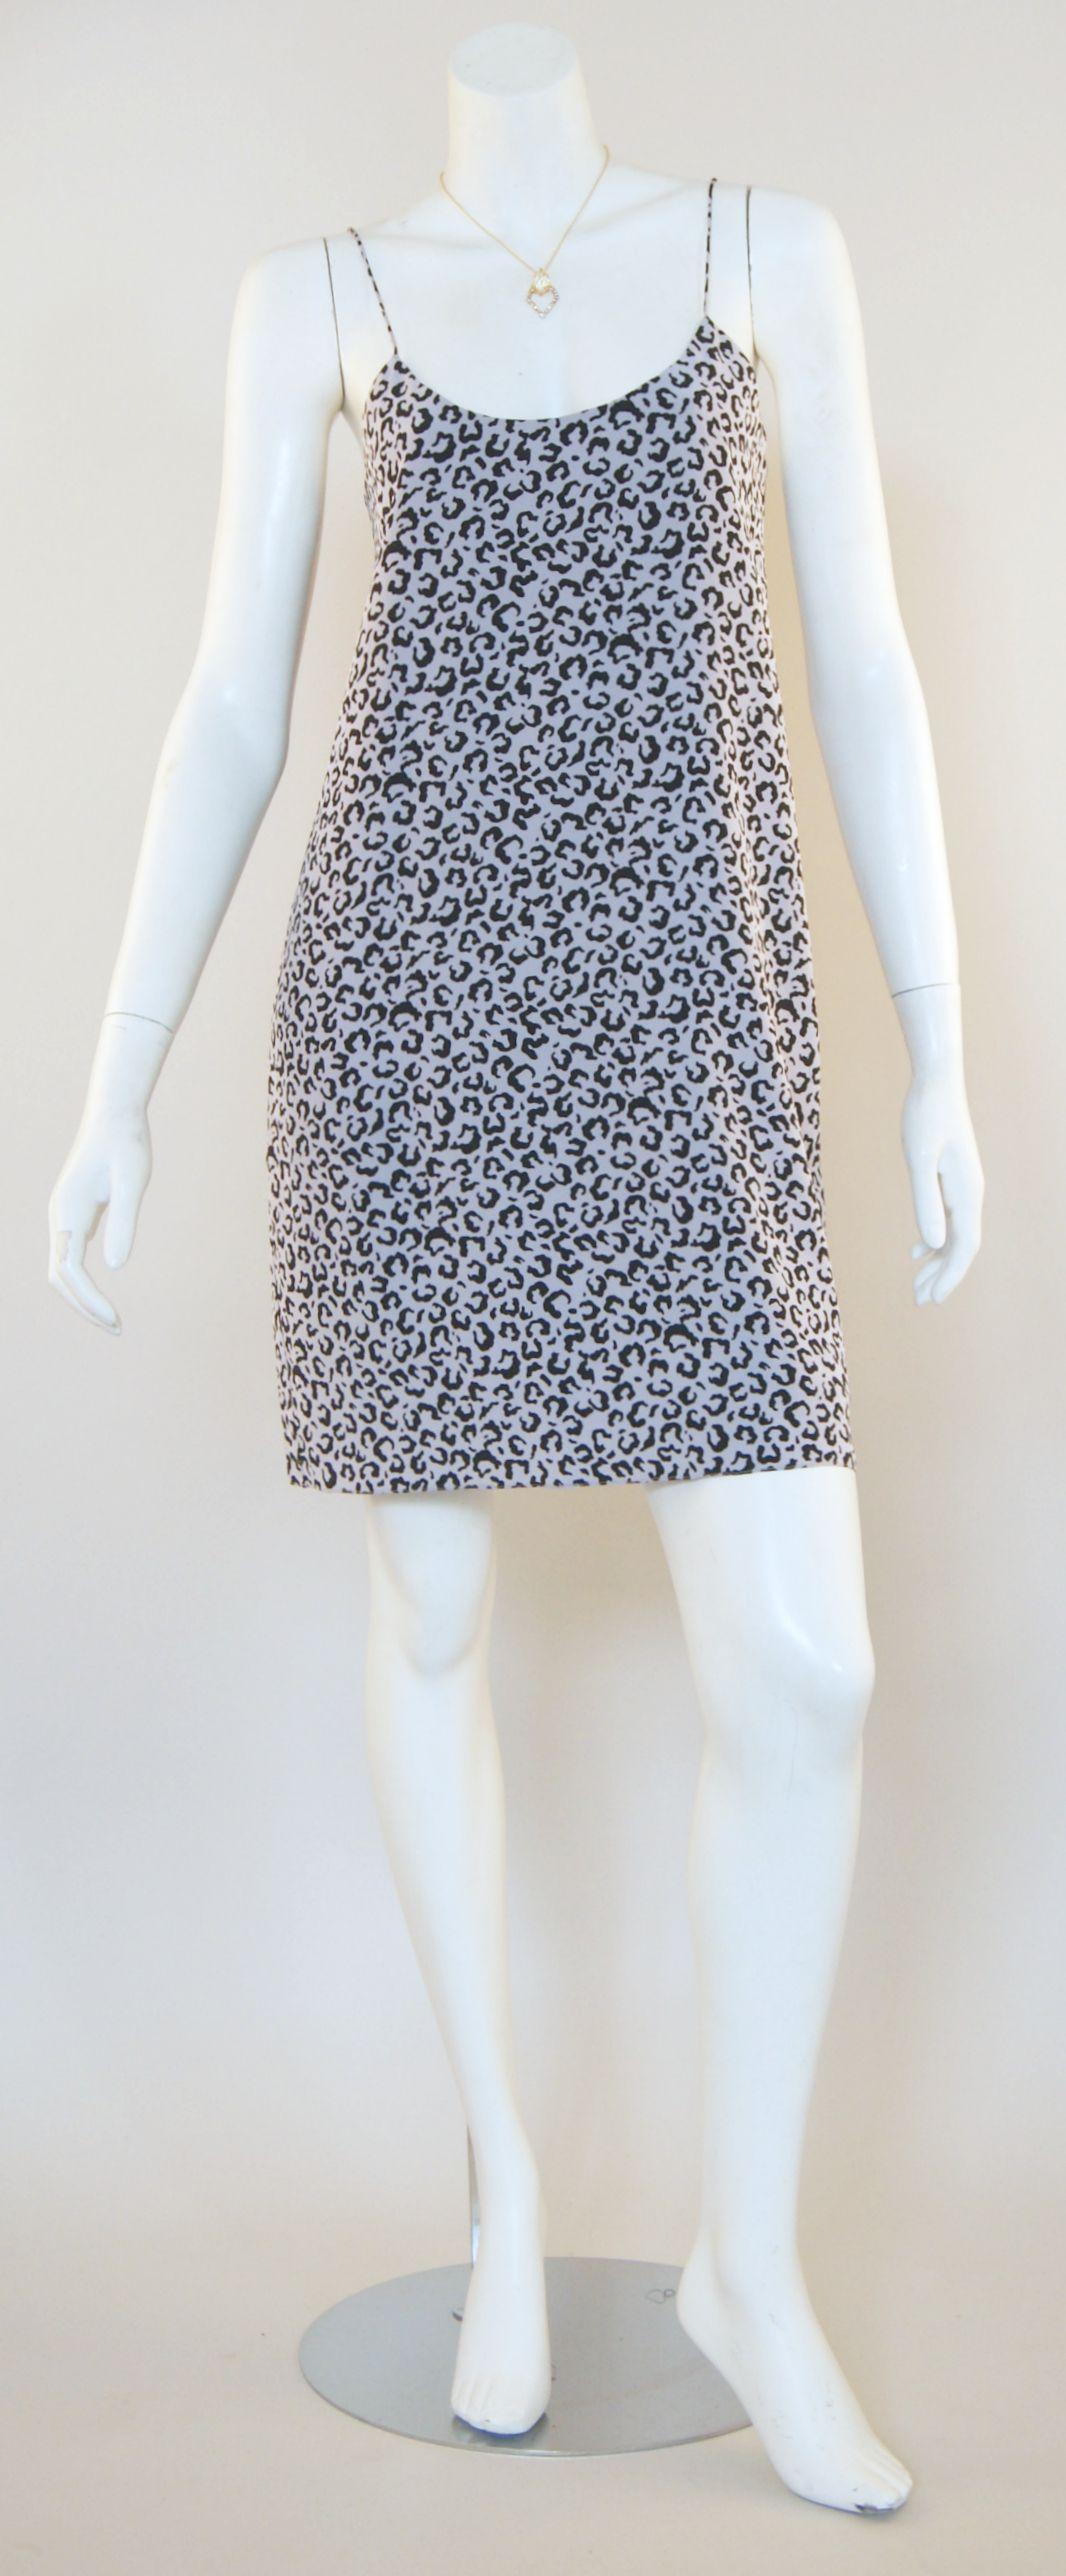 Tibi Leona Print Tank Dress & Alexis Bittar Necklace